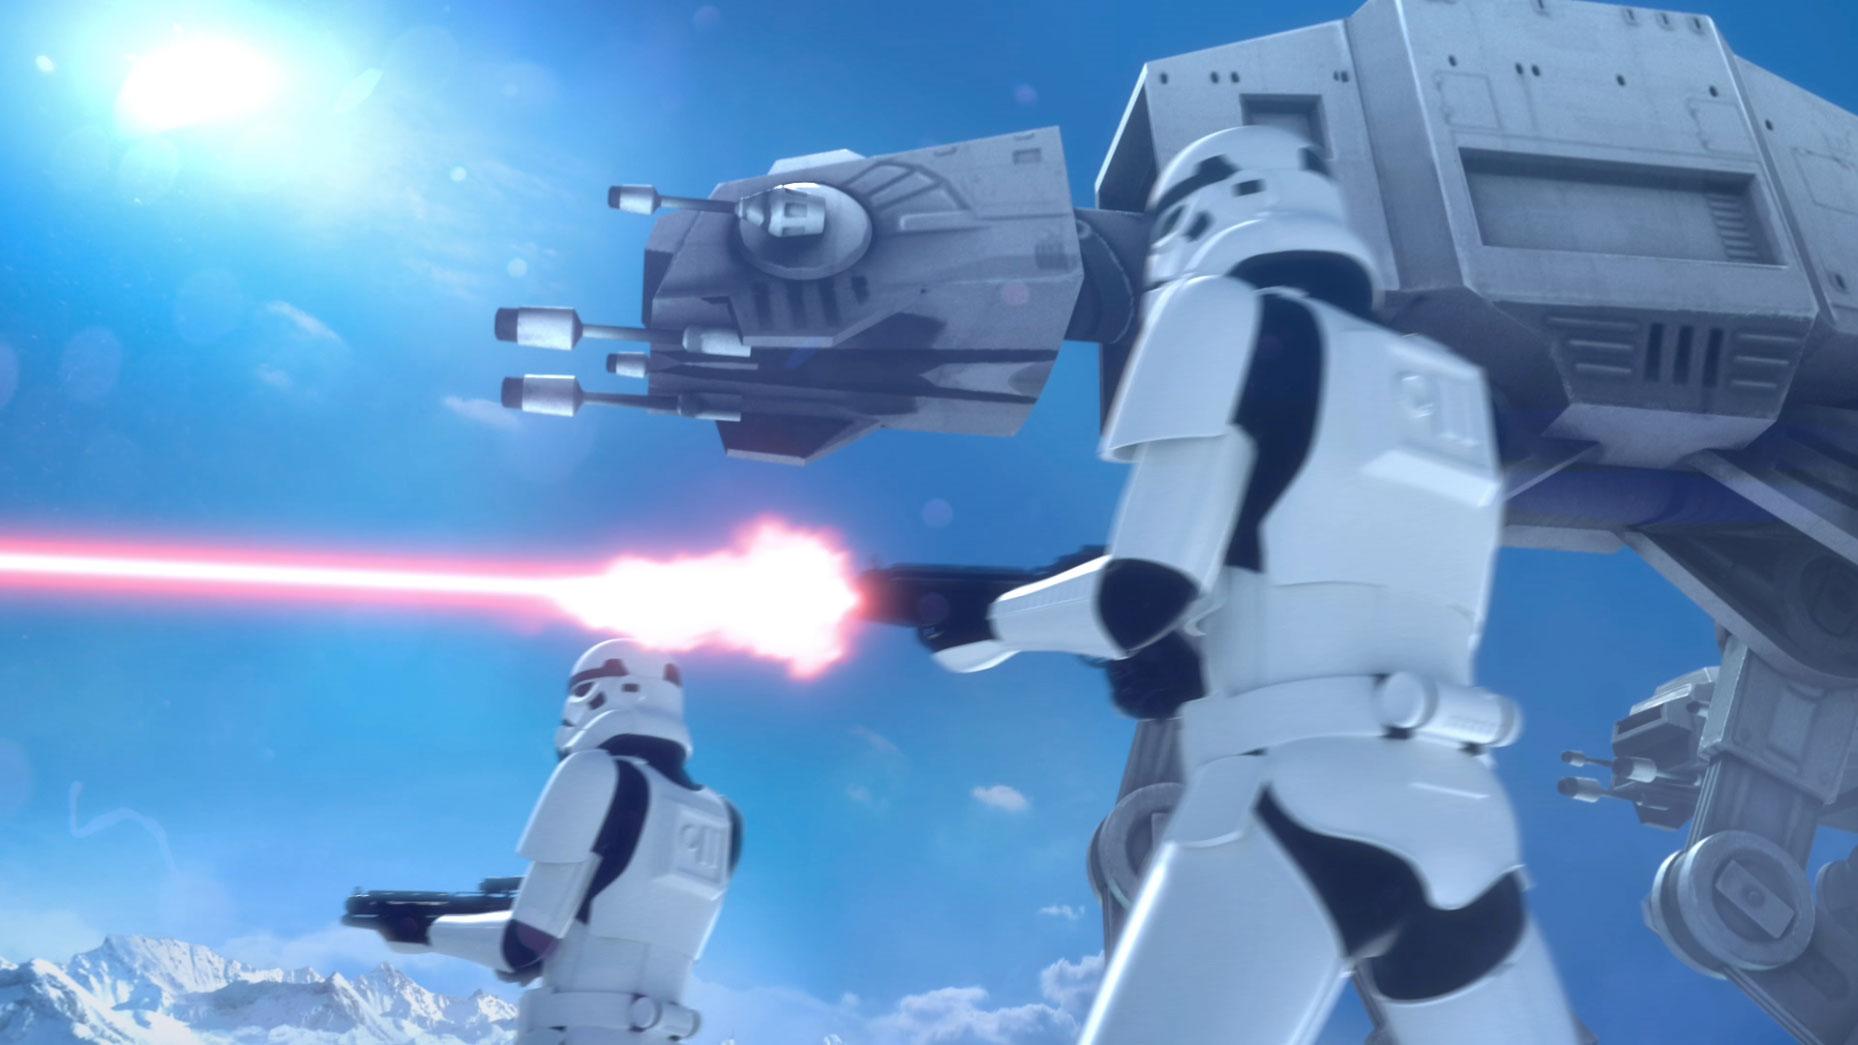 "<a href=""/star-wars-commander"">Star Wars: Commander</a>"